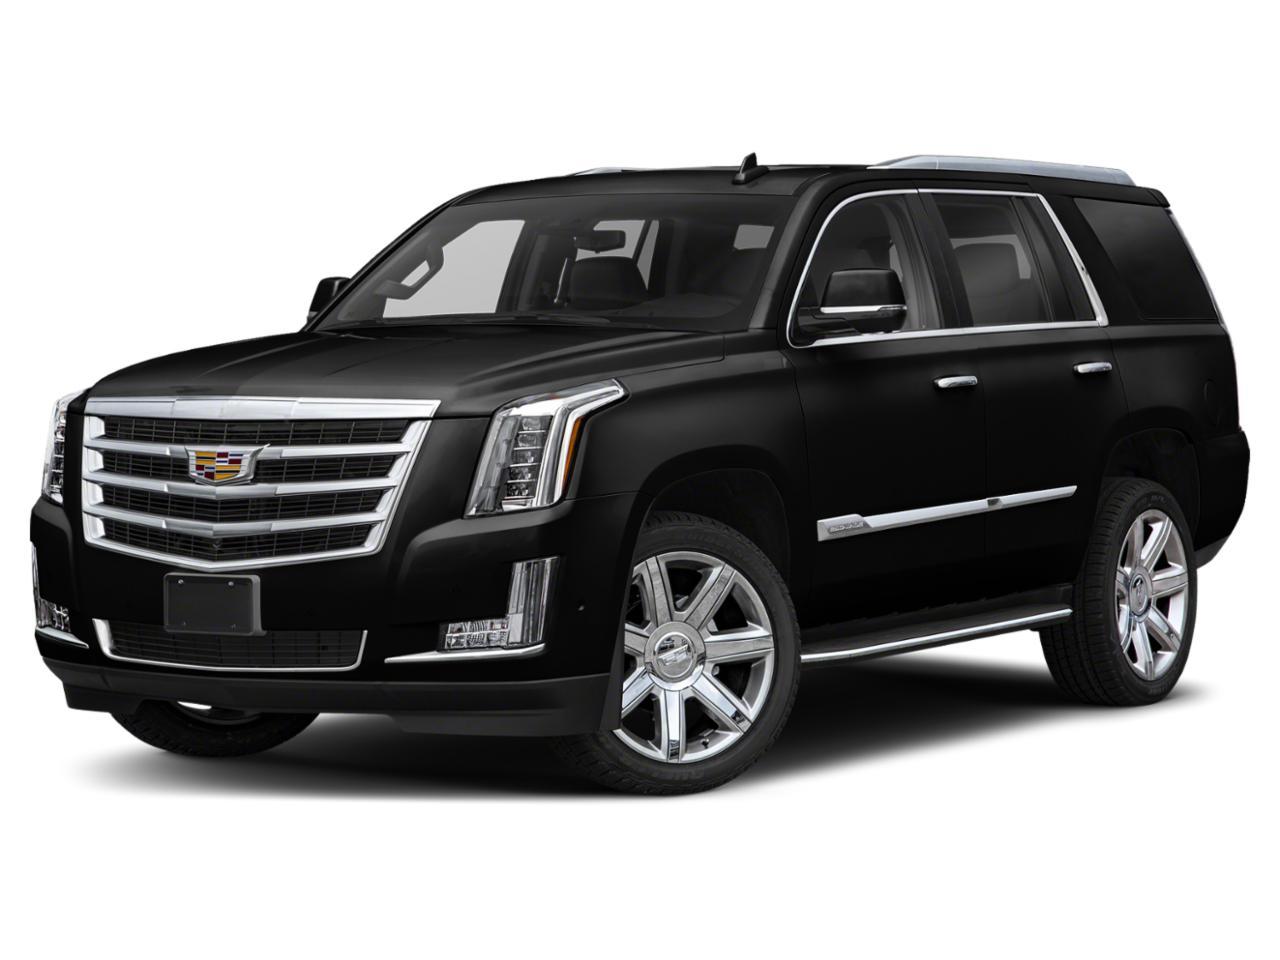 2020 Cadillac Escalade Vehicle Photo in Dallas, TX 75209